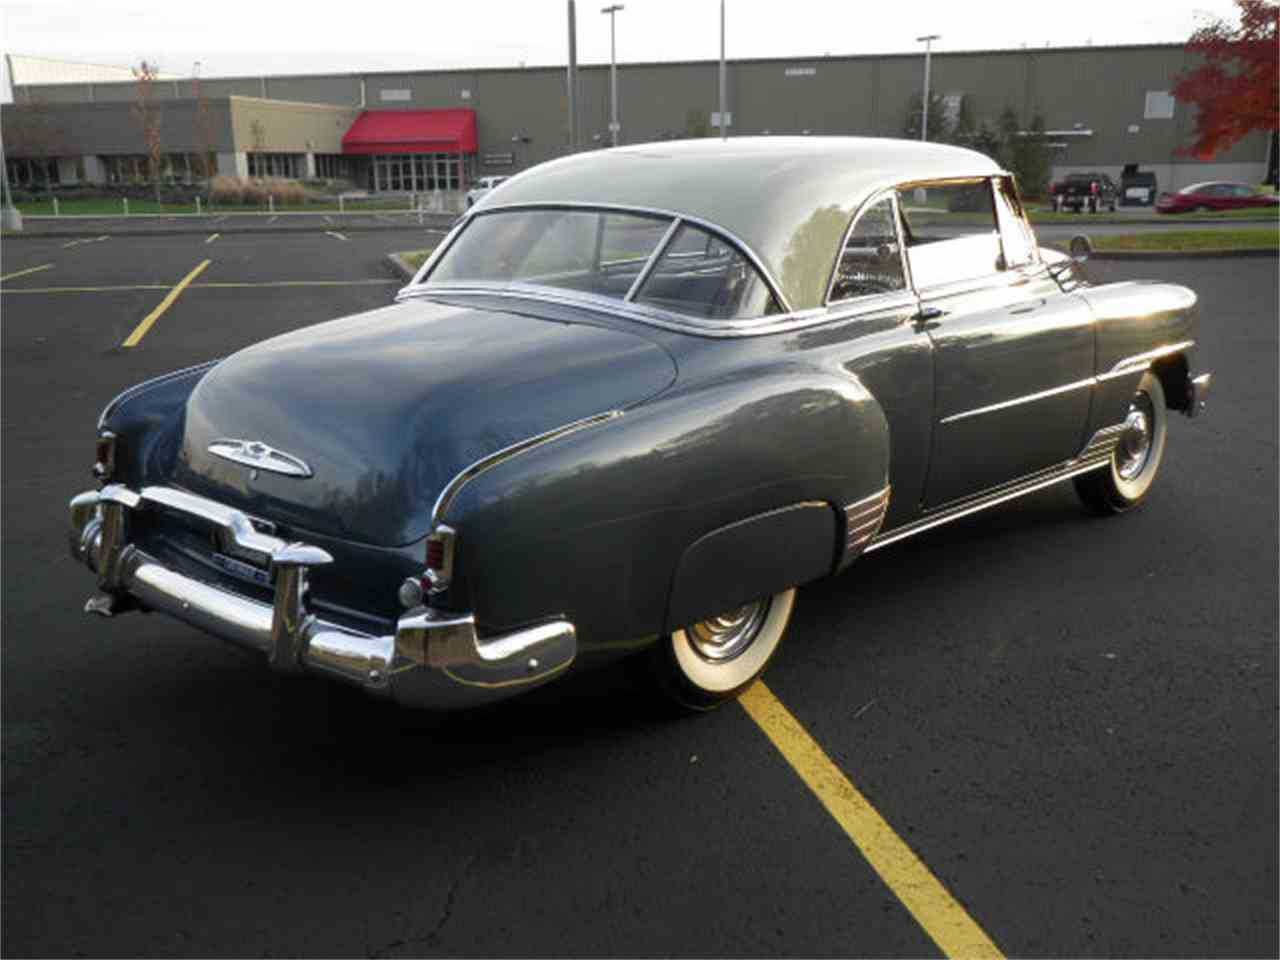 1951 Chevrolet Deluxe Bel Air Styleline For Sale In Milford Oh 2 Door